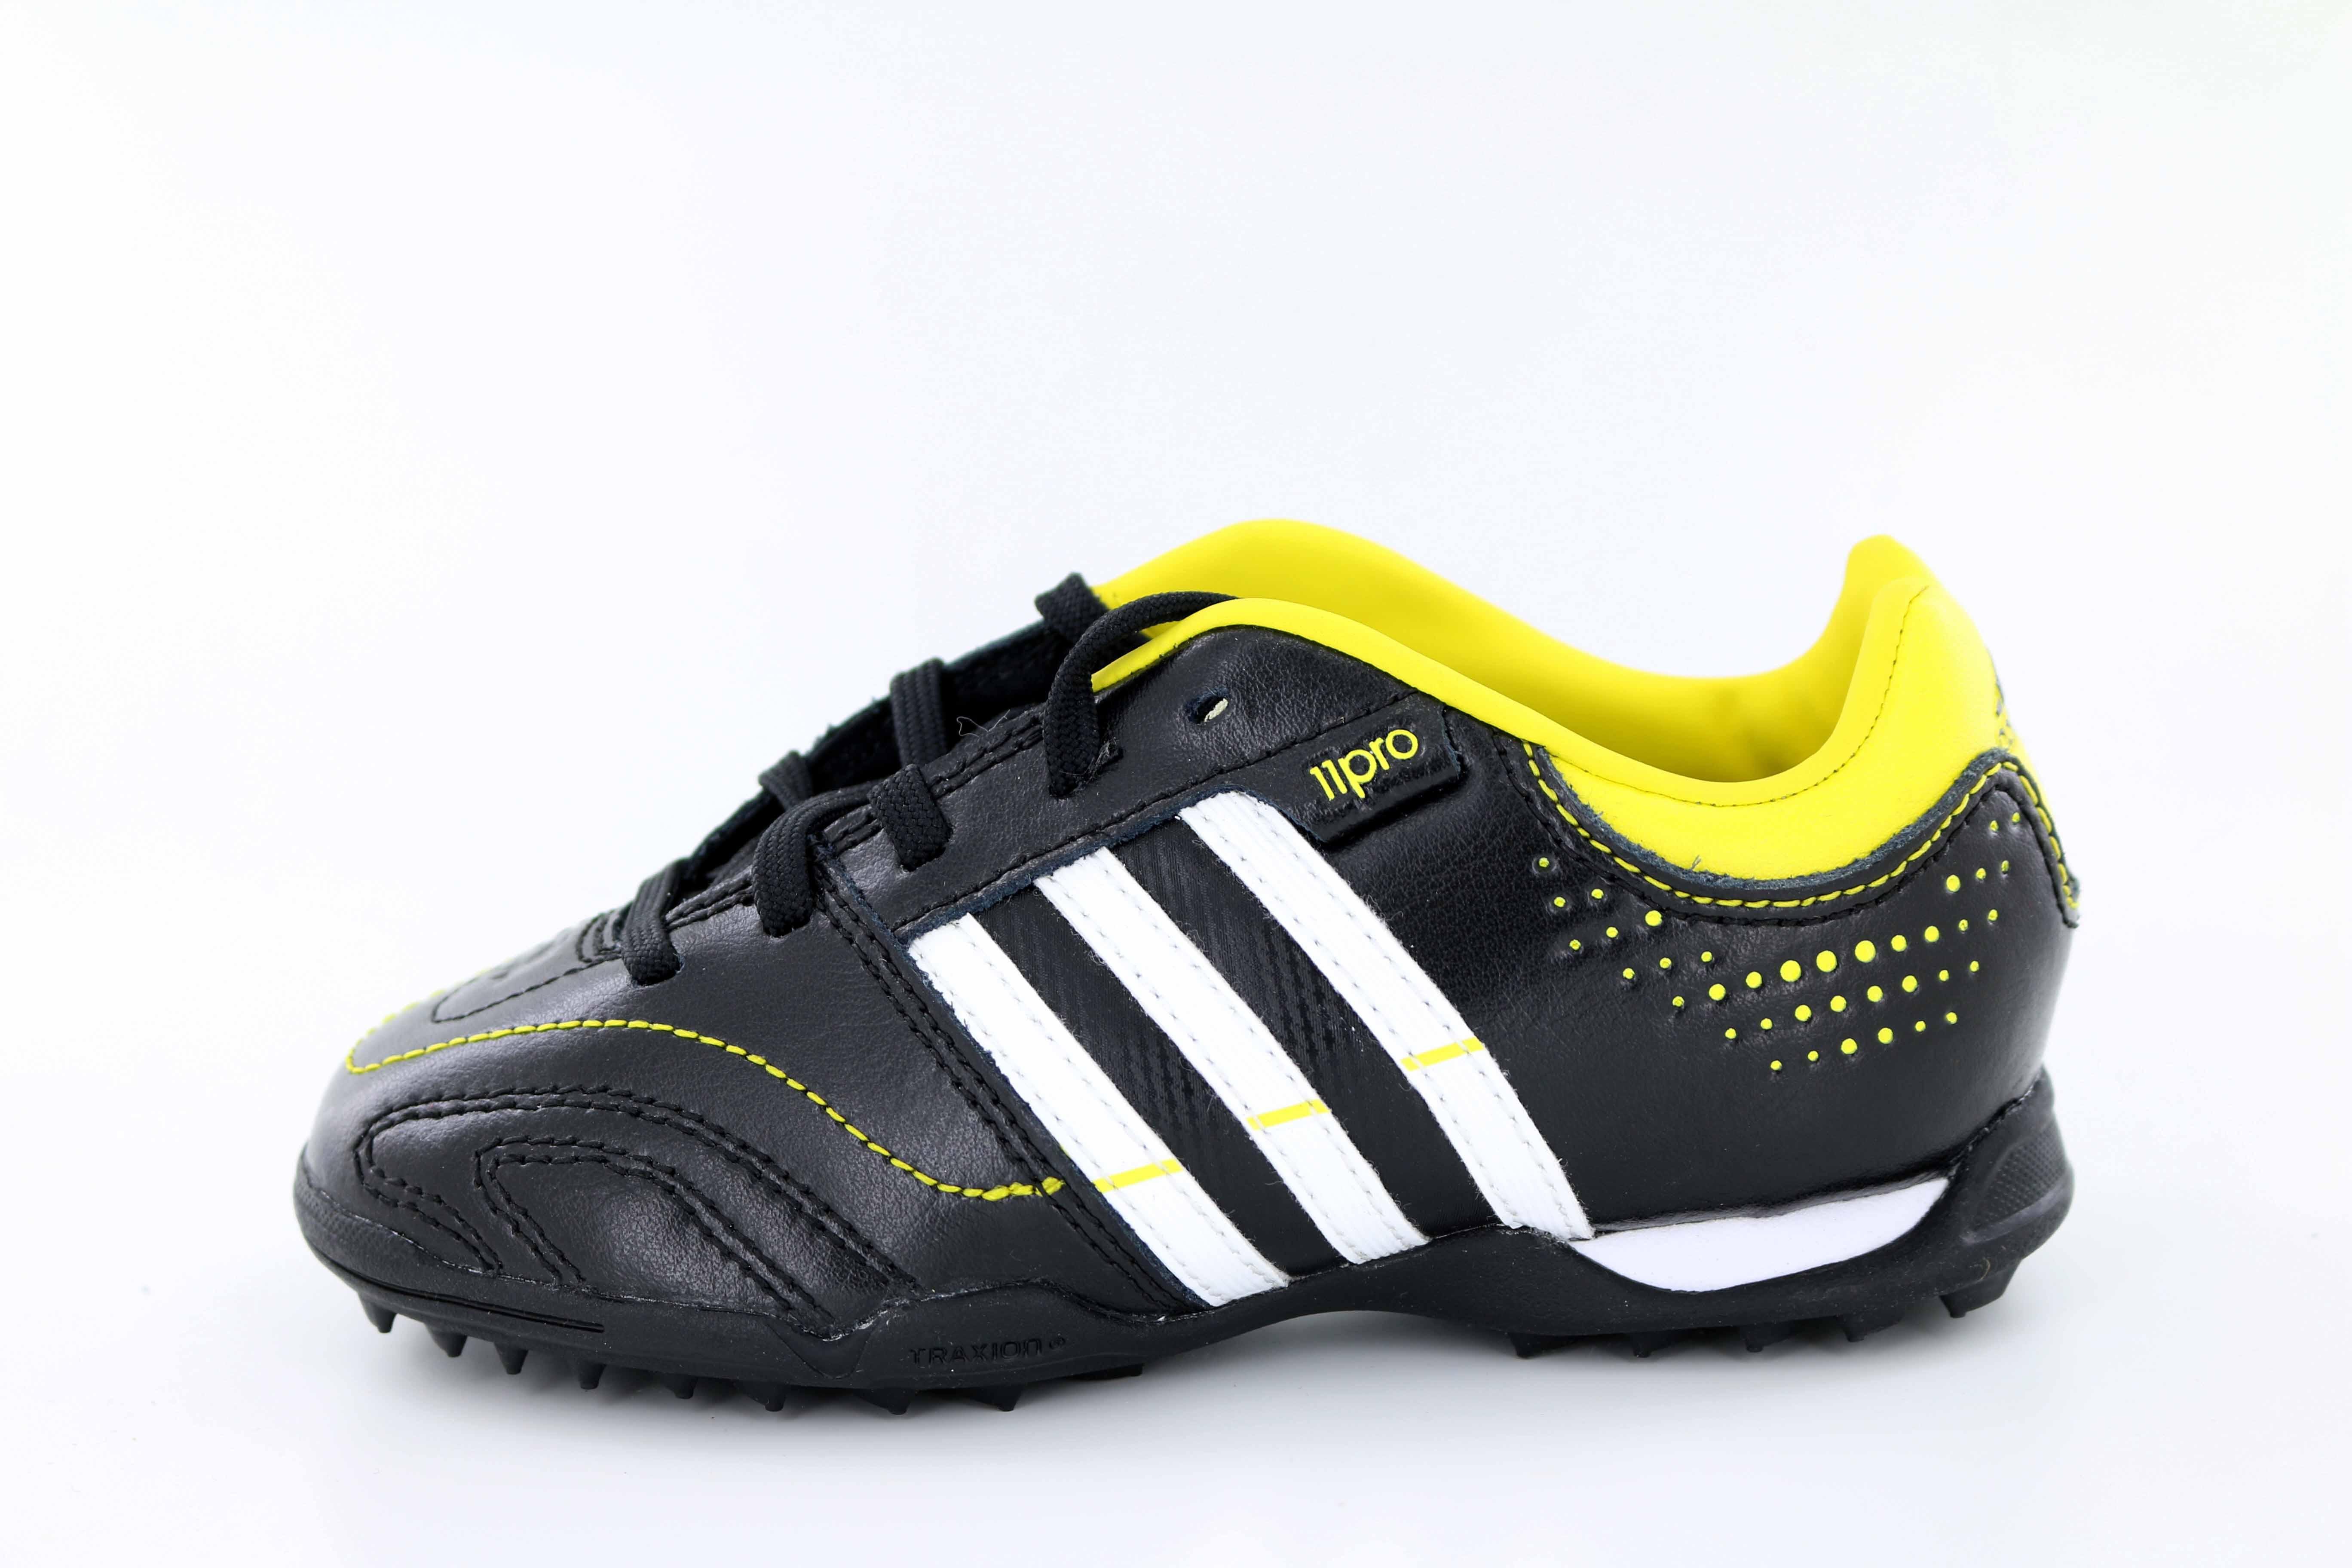 924f5378a Adidas 11Nova TRX TF J - Soccer Premier